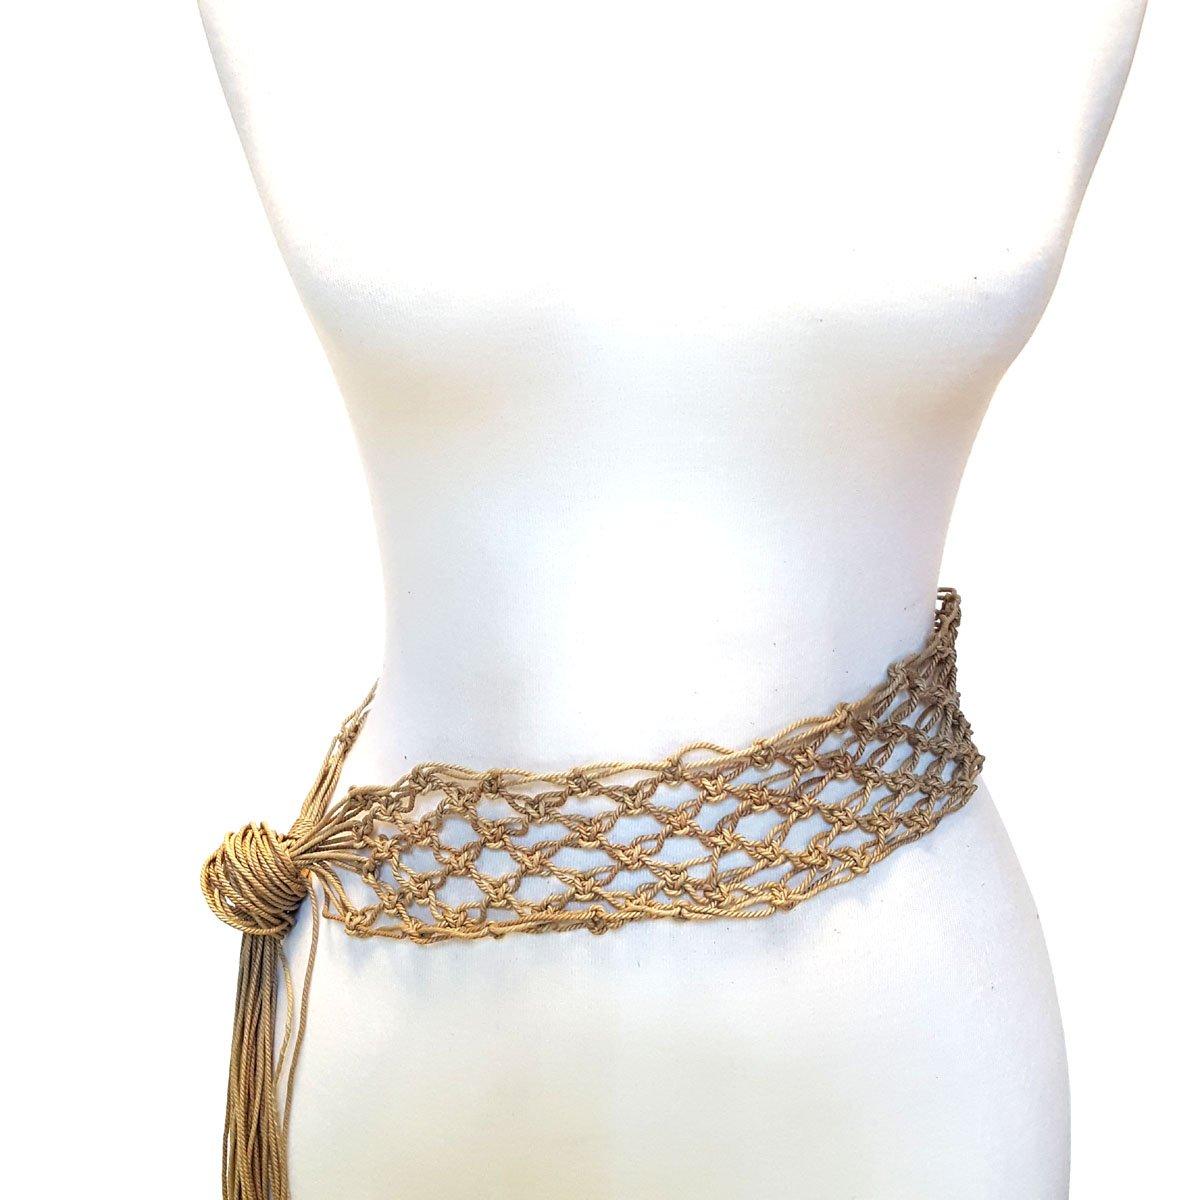 Hand Made Macreme Pattern Tie Belt in Tan S/M